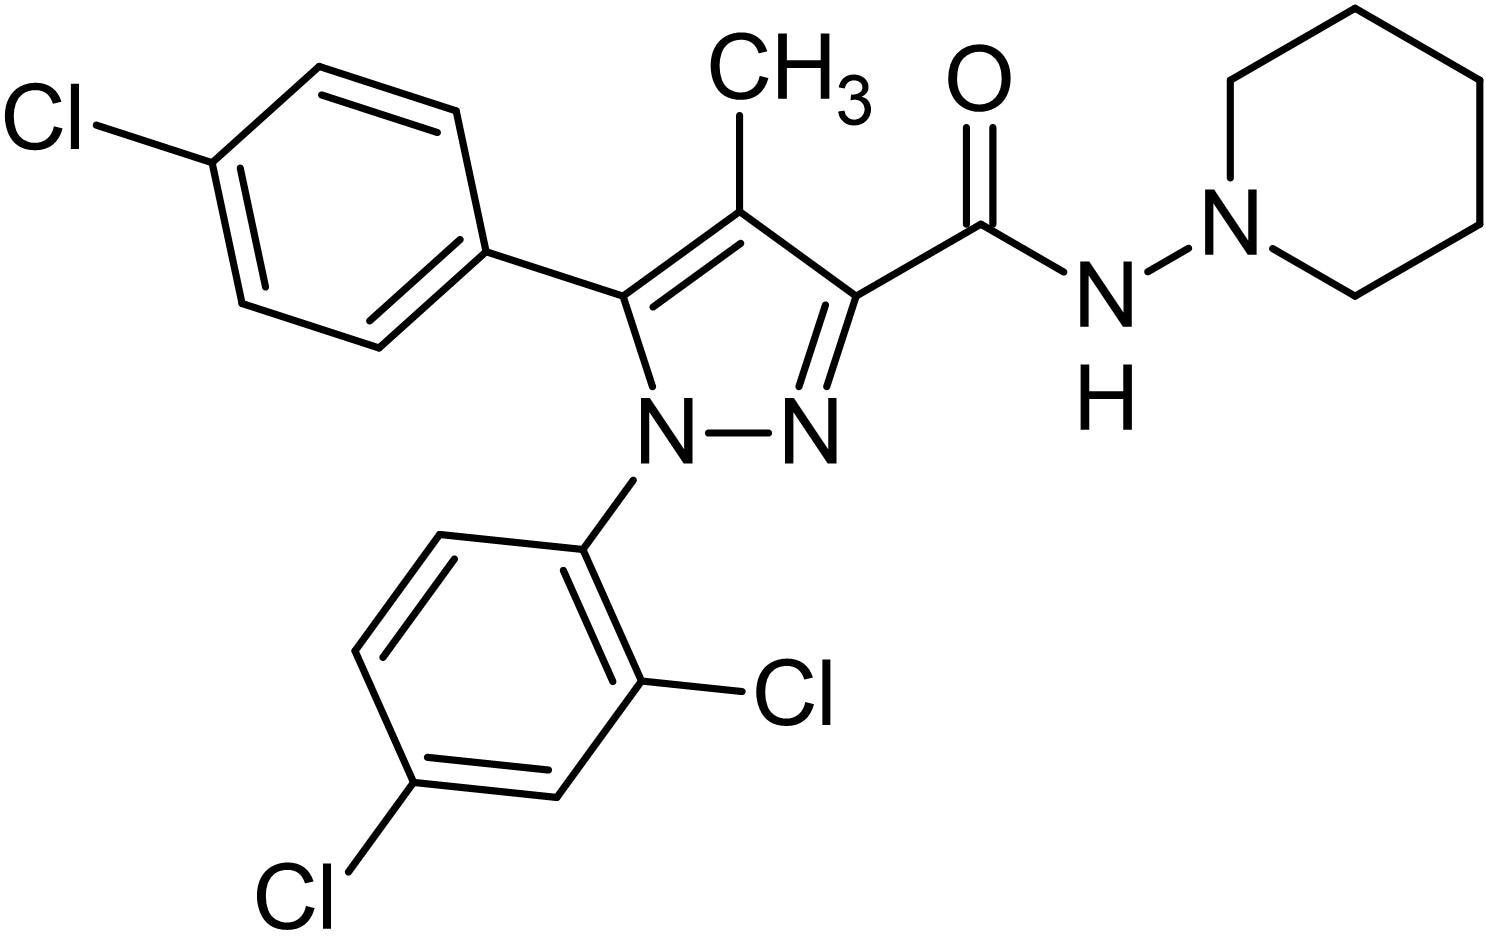 Chemical Structure - Rimonabant, cannabinoid CB<sub>1</sub> receptor antagonist/inverse agonist (ab144582)